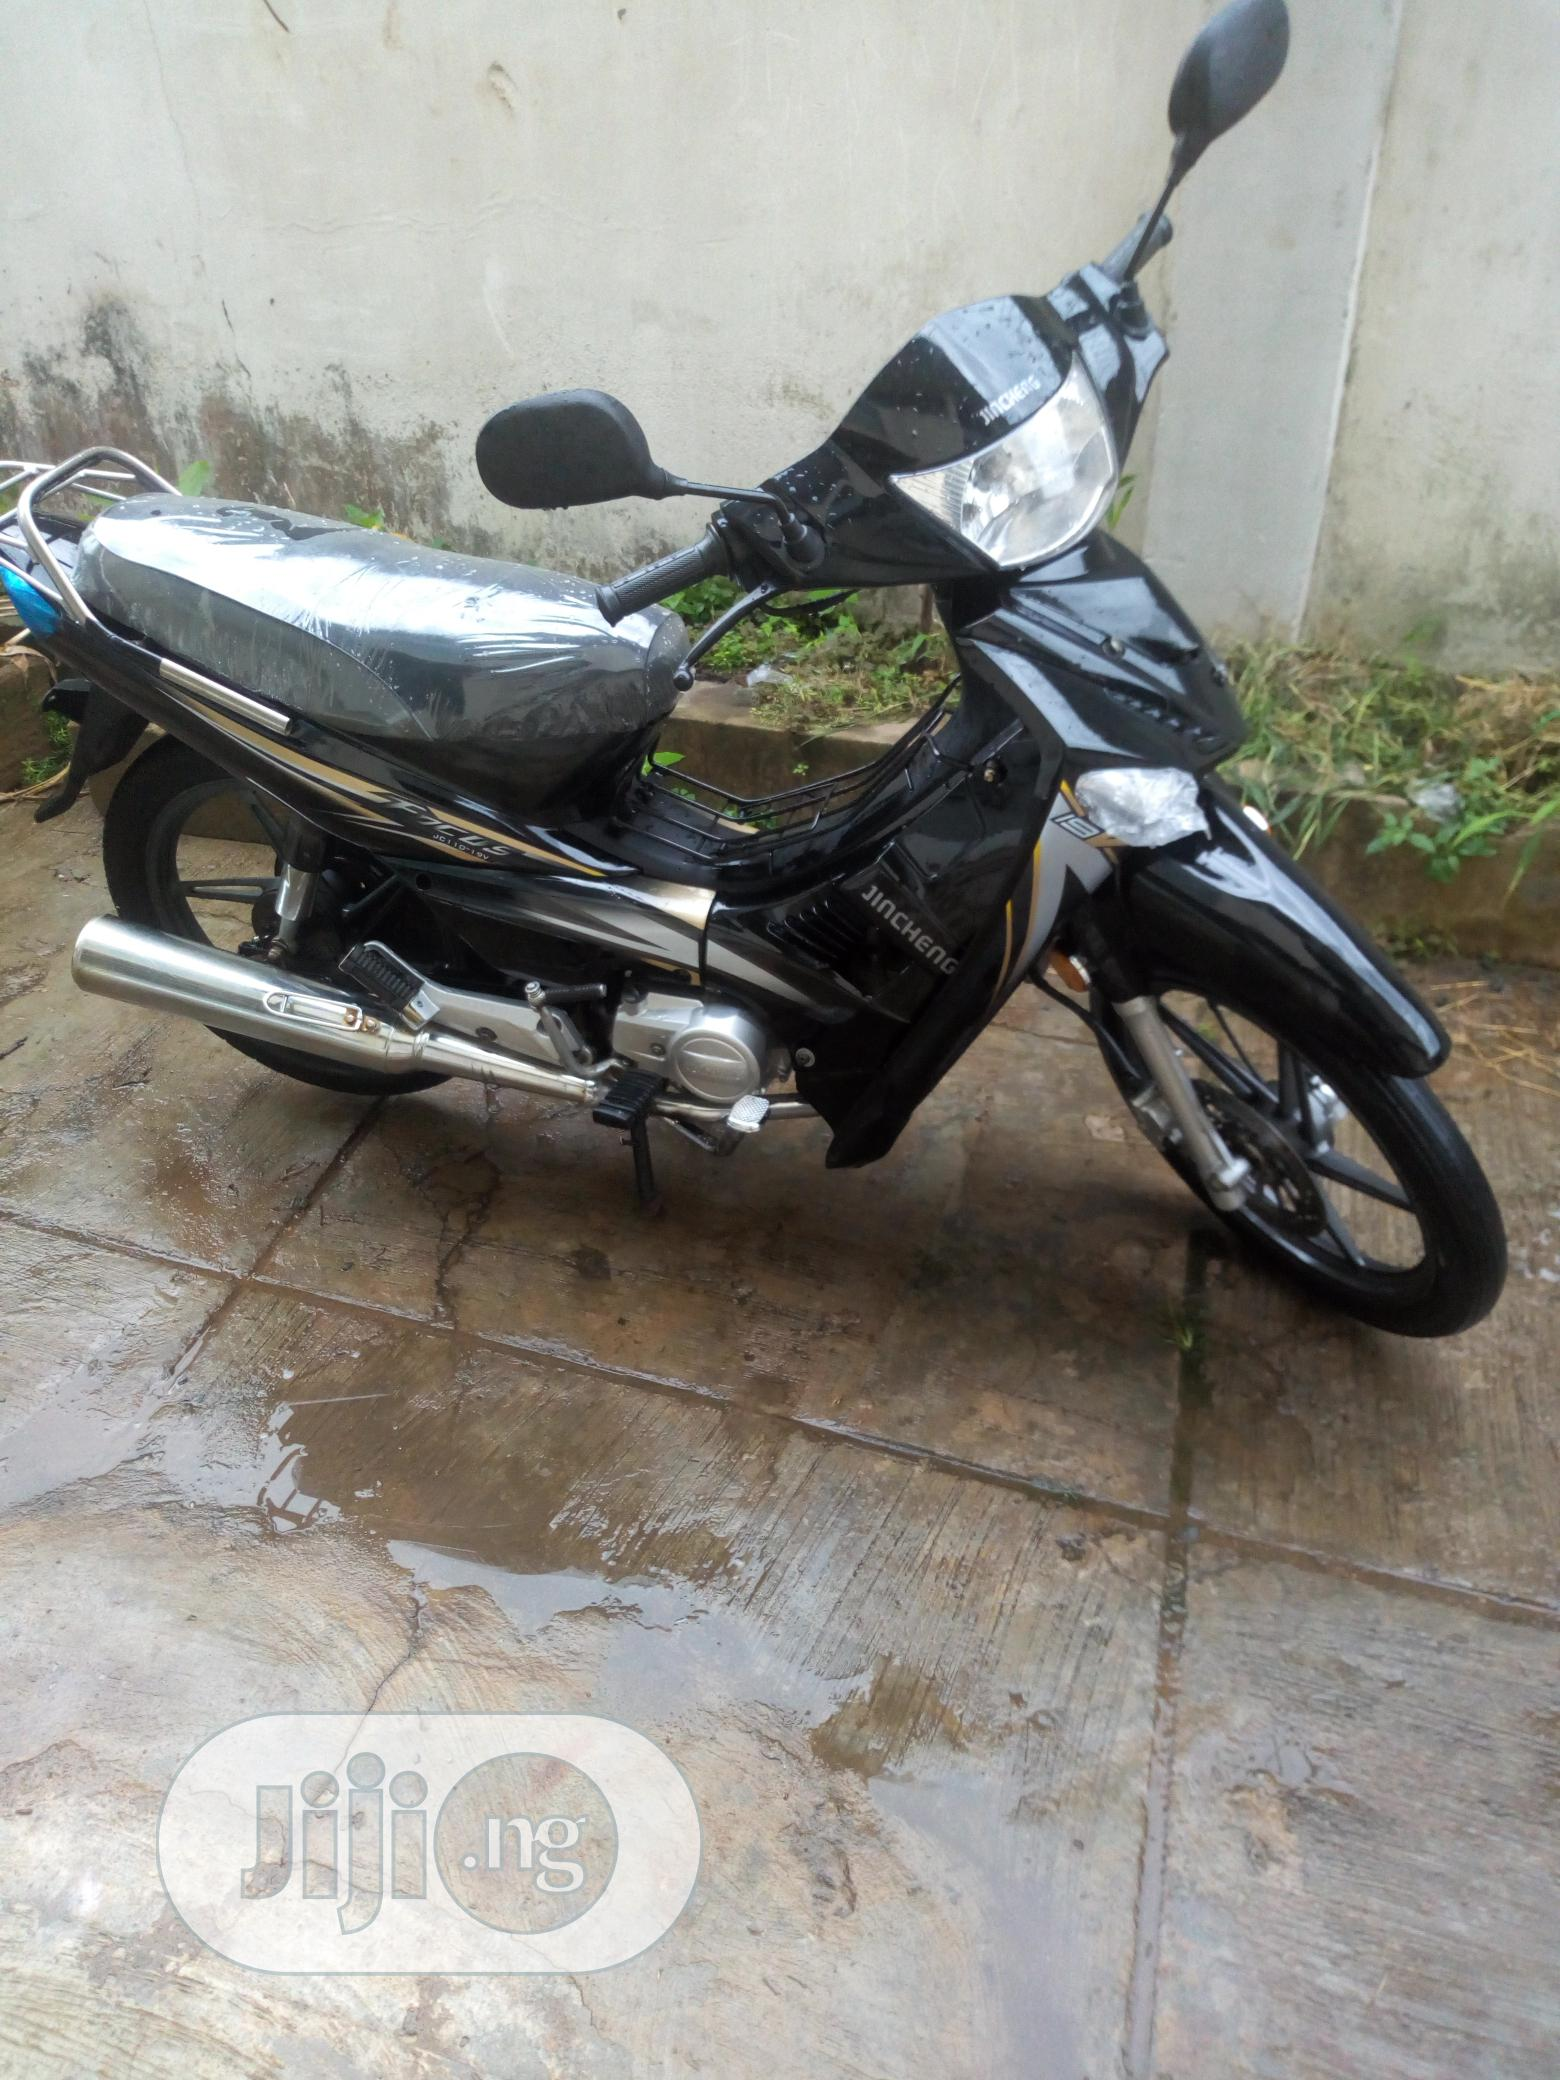 Jincheng Bike 2008 Black | Motorcycles & Scooters for sale in Ibadan, Oyo State, Nigeria